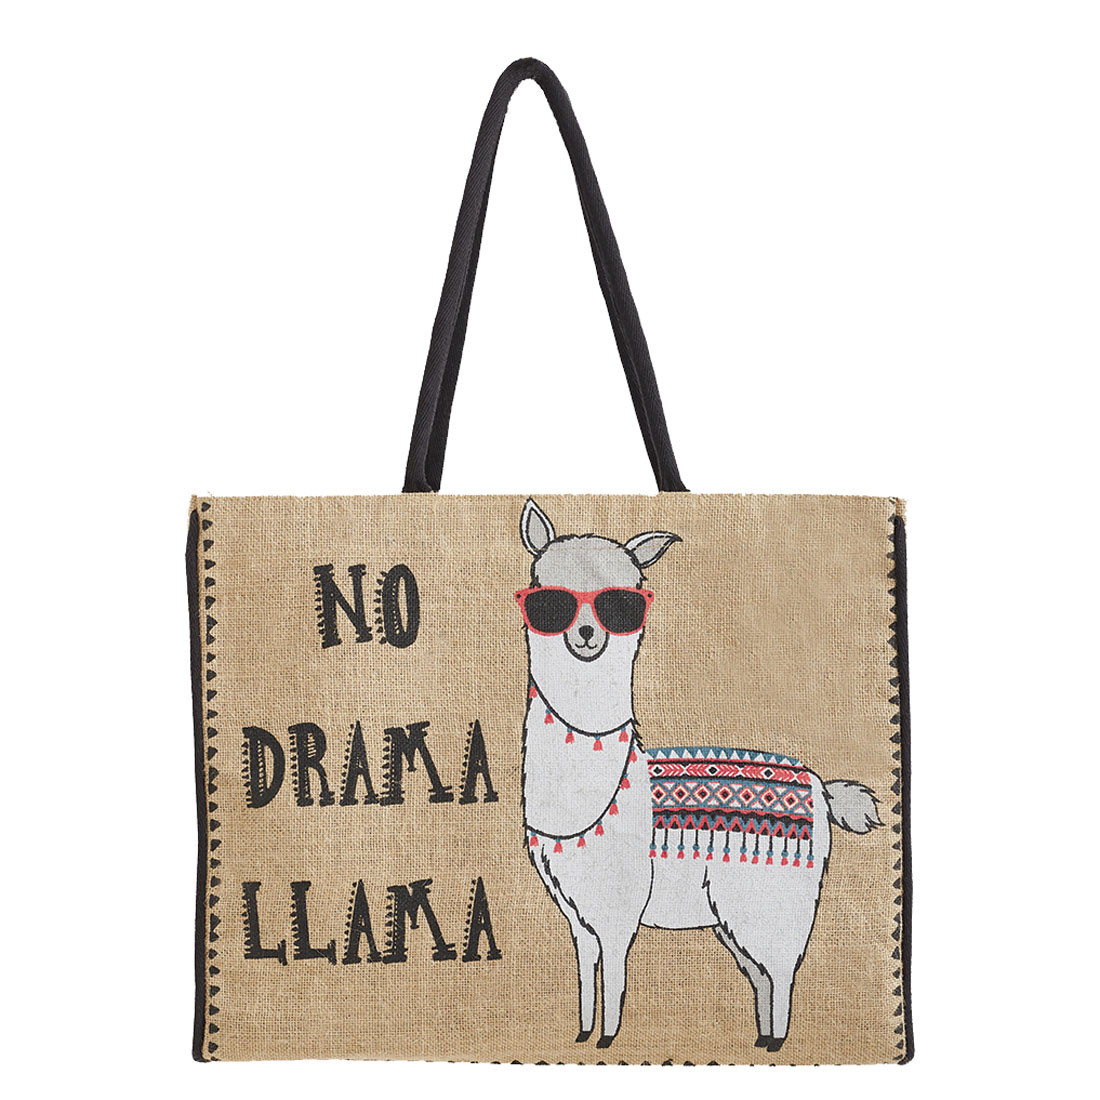 6eefc2749e86 Mona B Large No Drama Llama Burlap Tote Shopping Market Bag